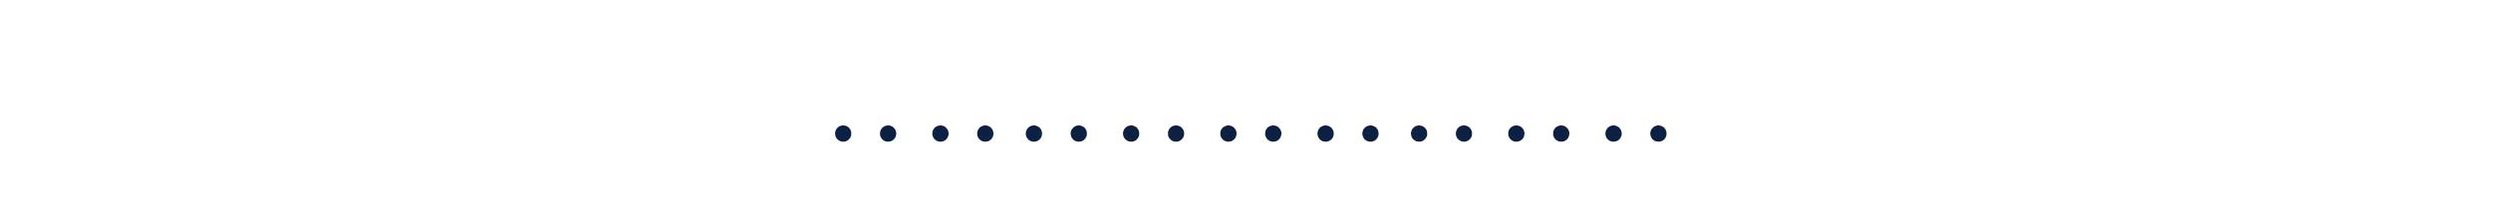 dots-25.jpg